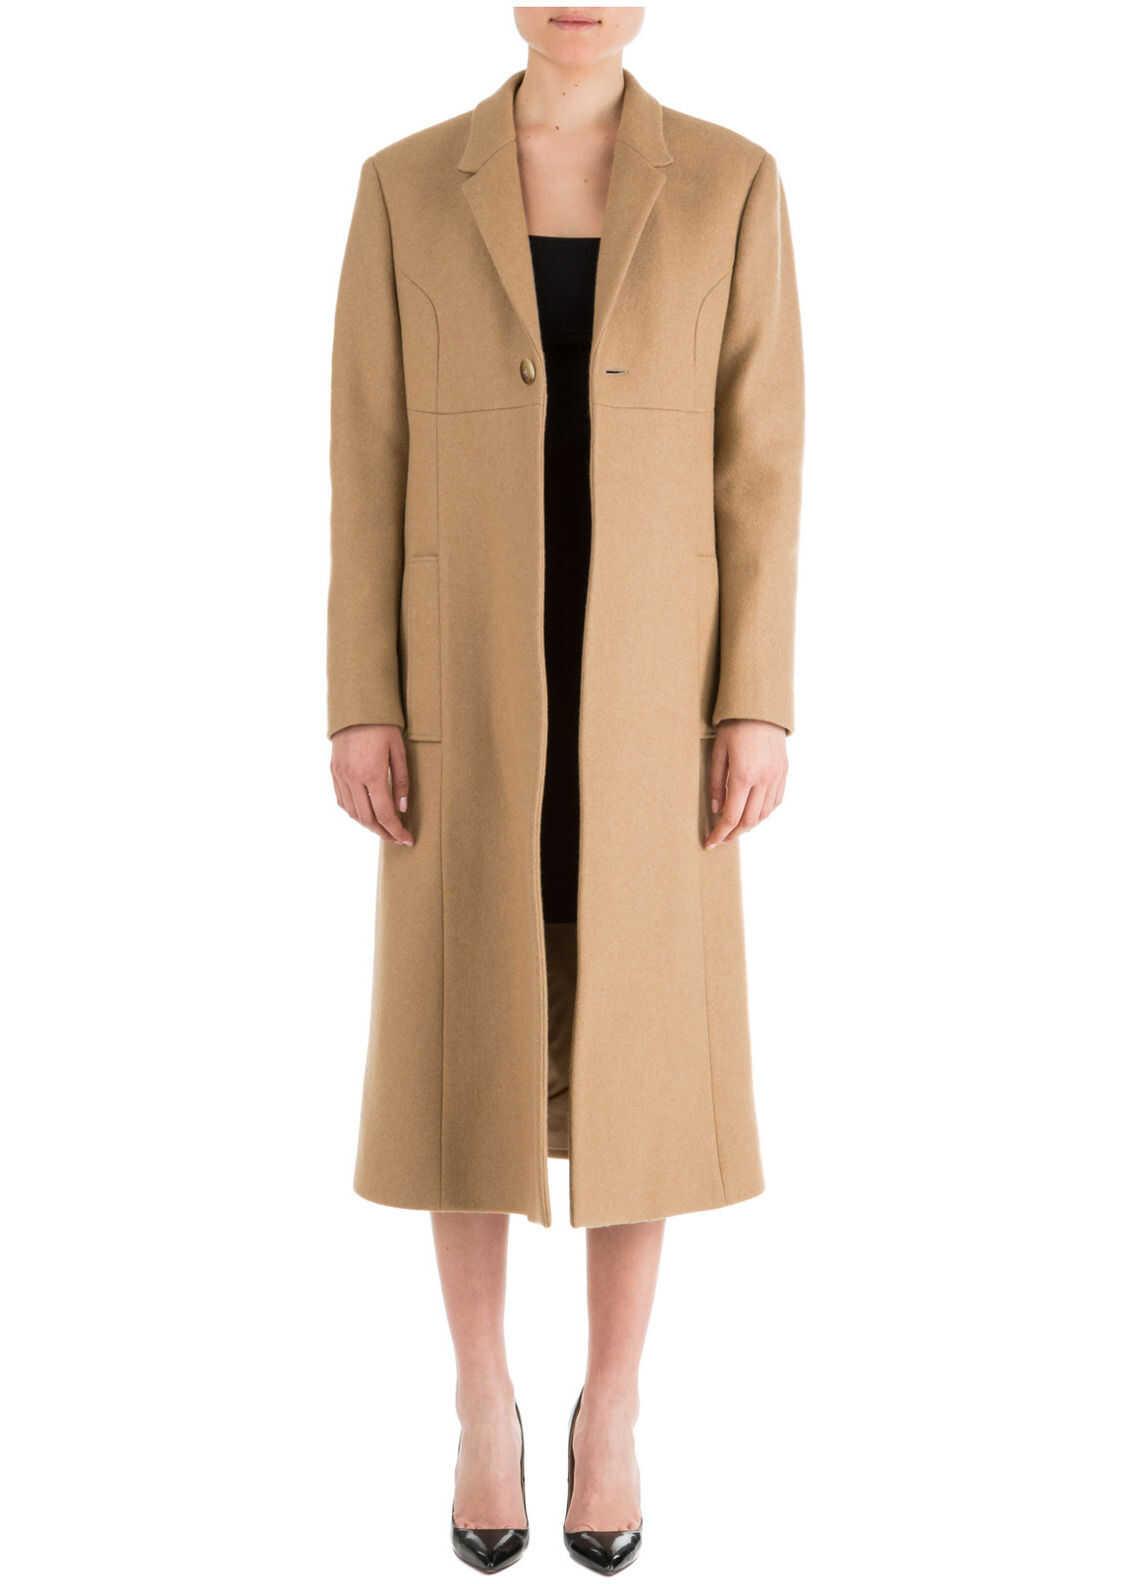 Neil Barrett Wool Coat PNCA229M029 549 Brown image0